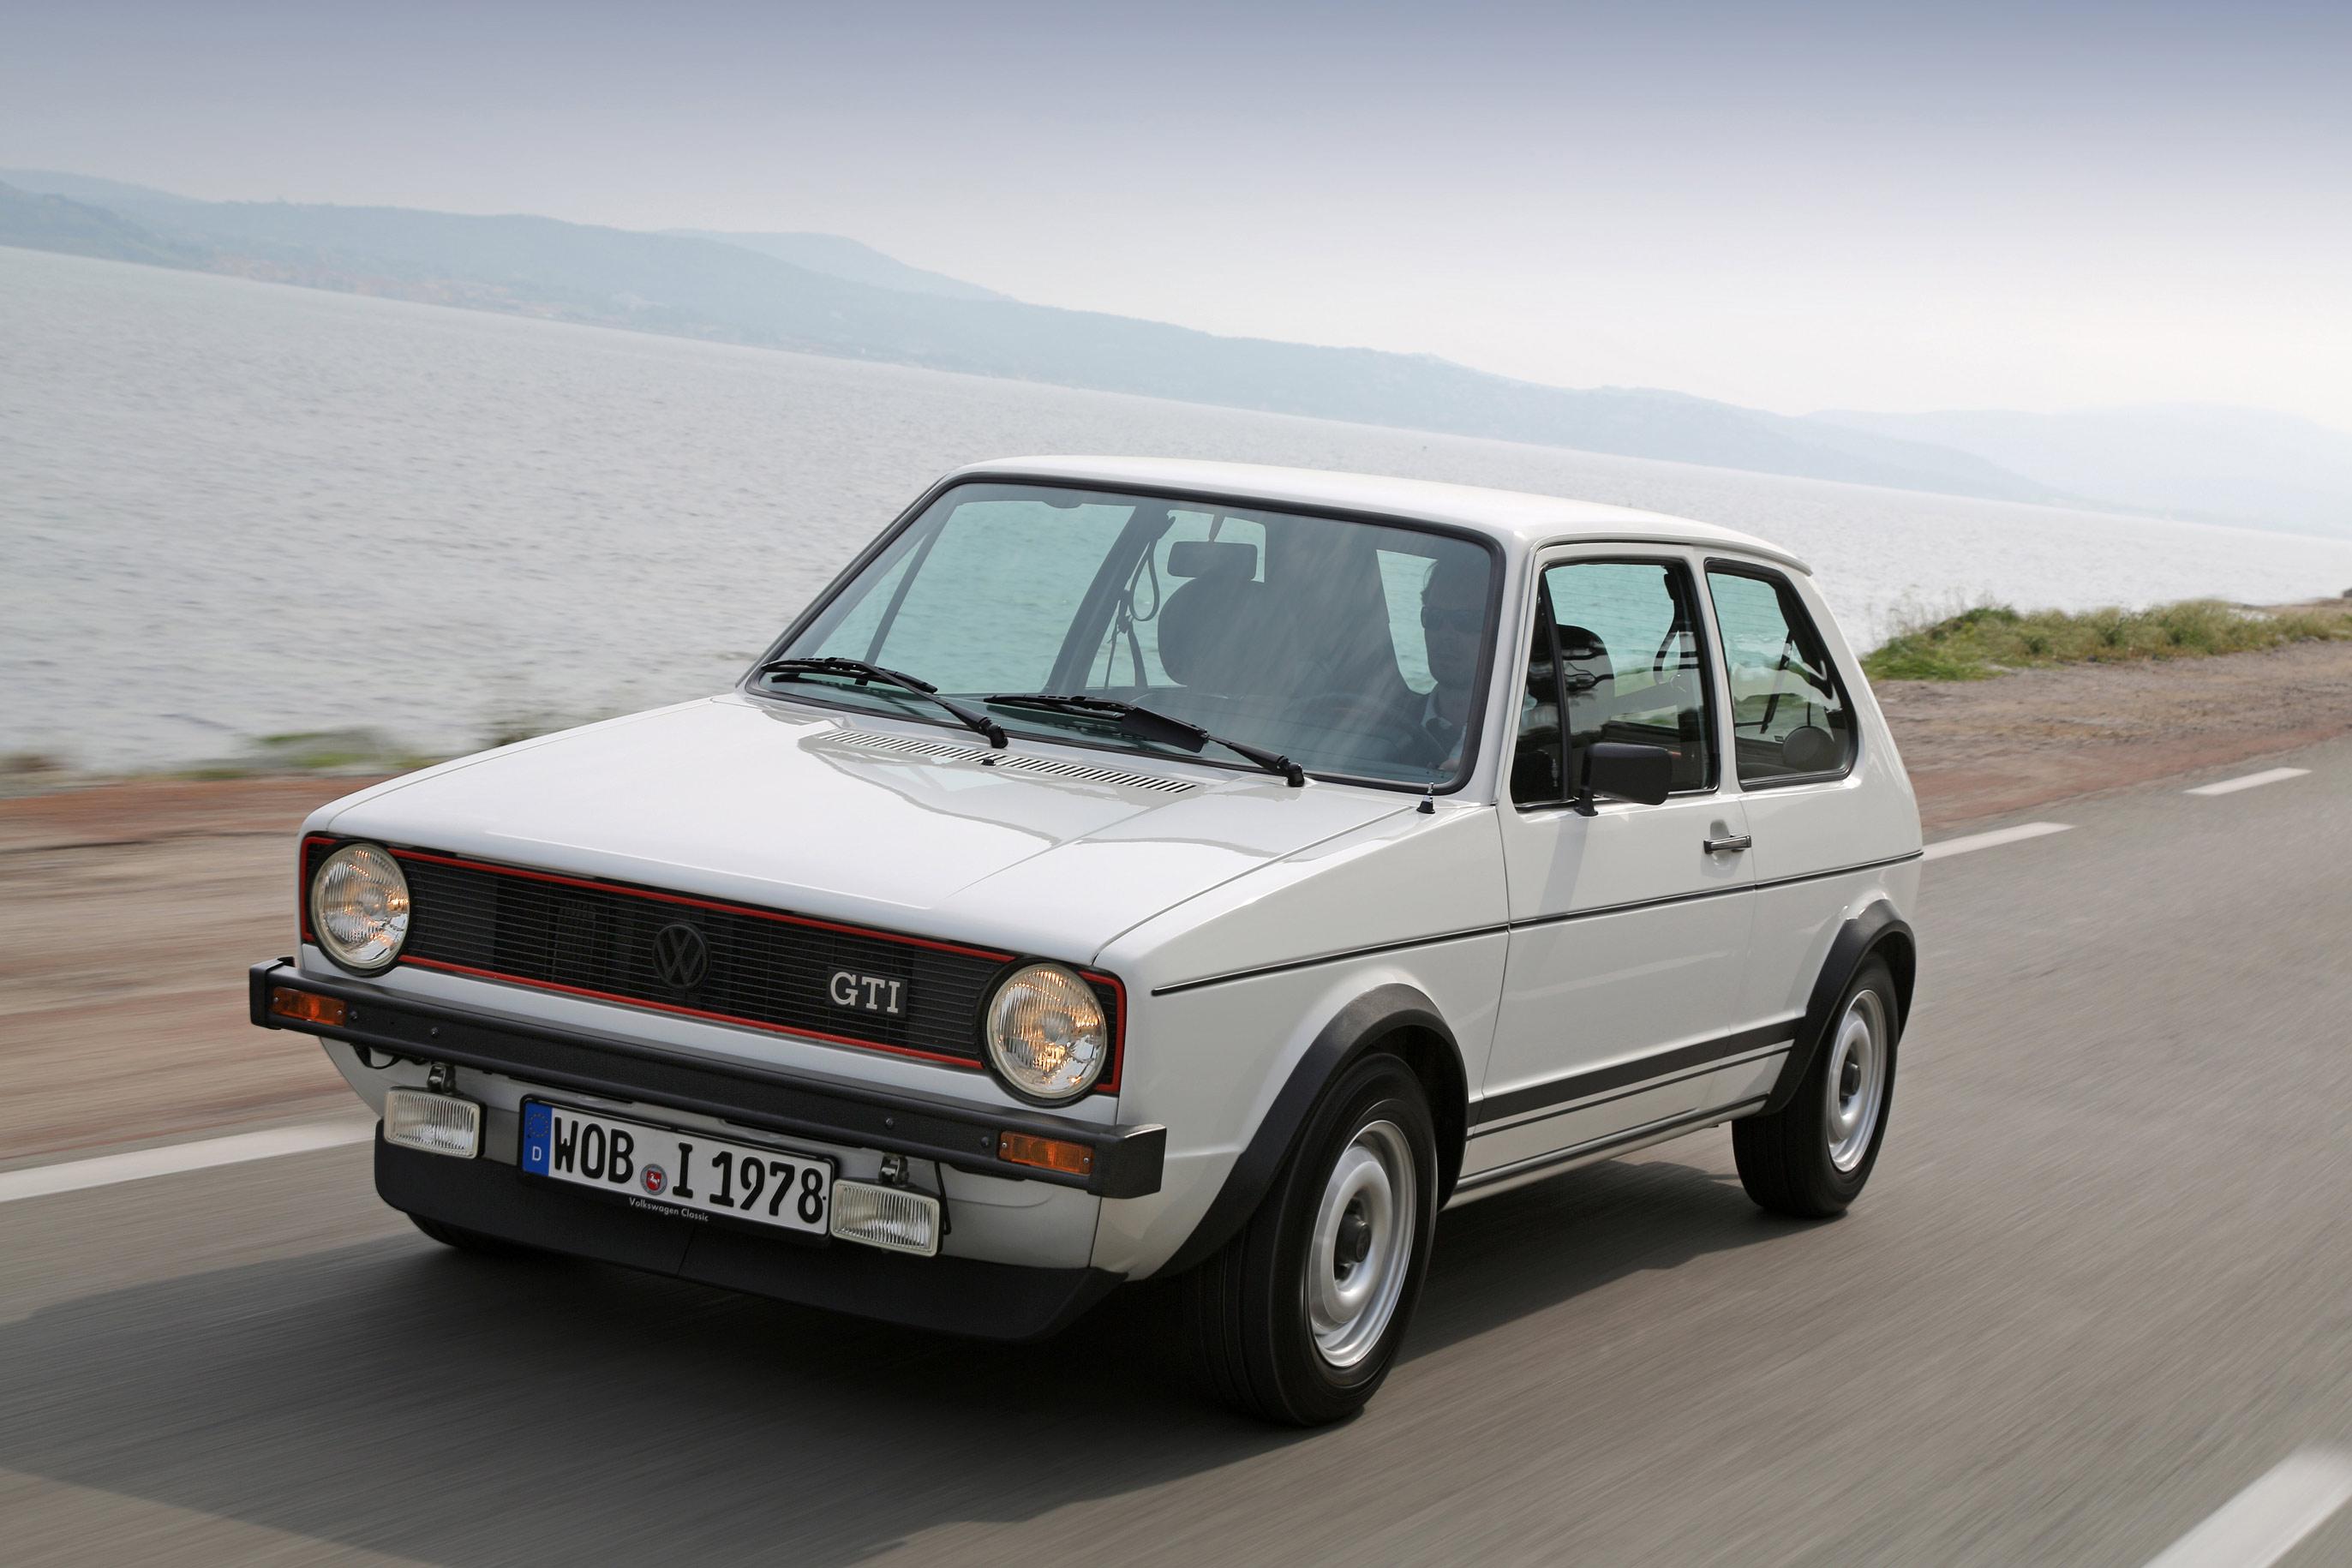 volkswagen-golf-7-gti-061